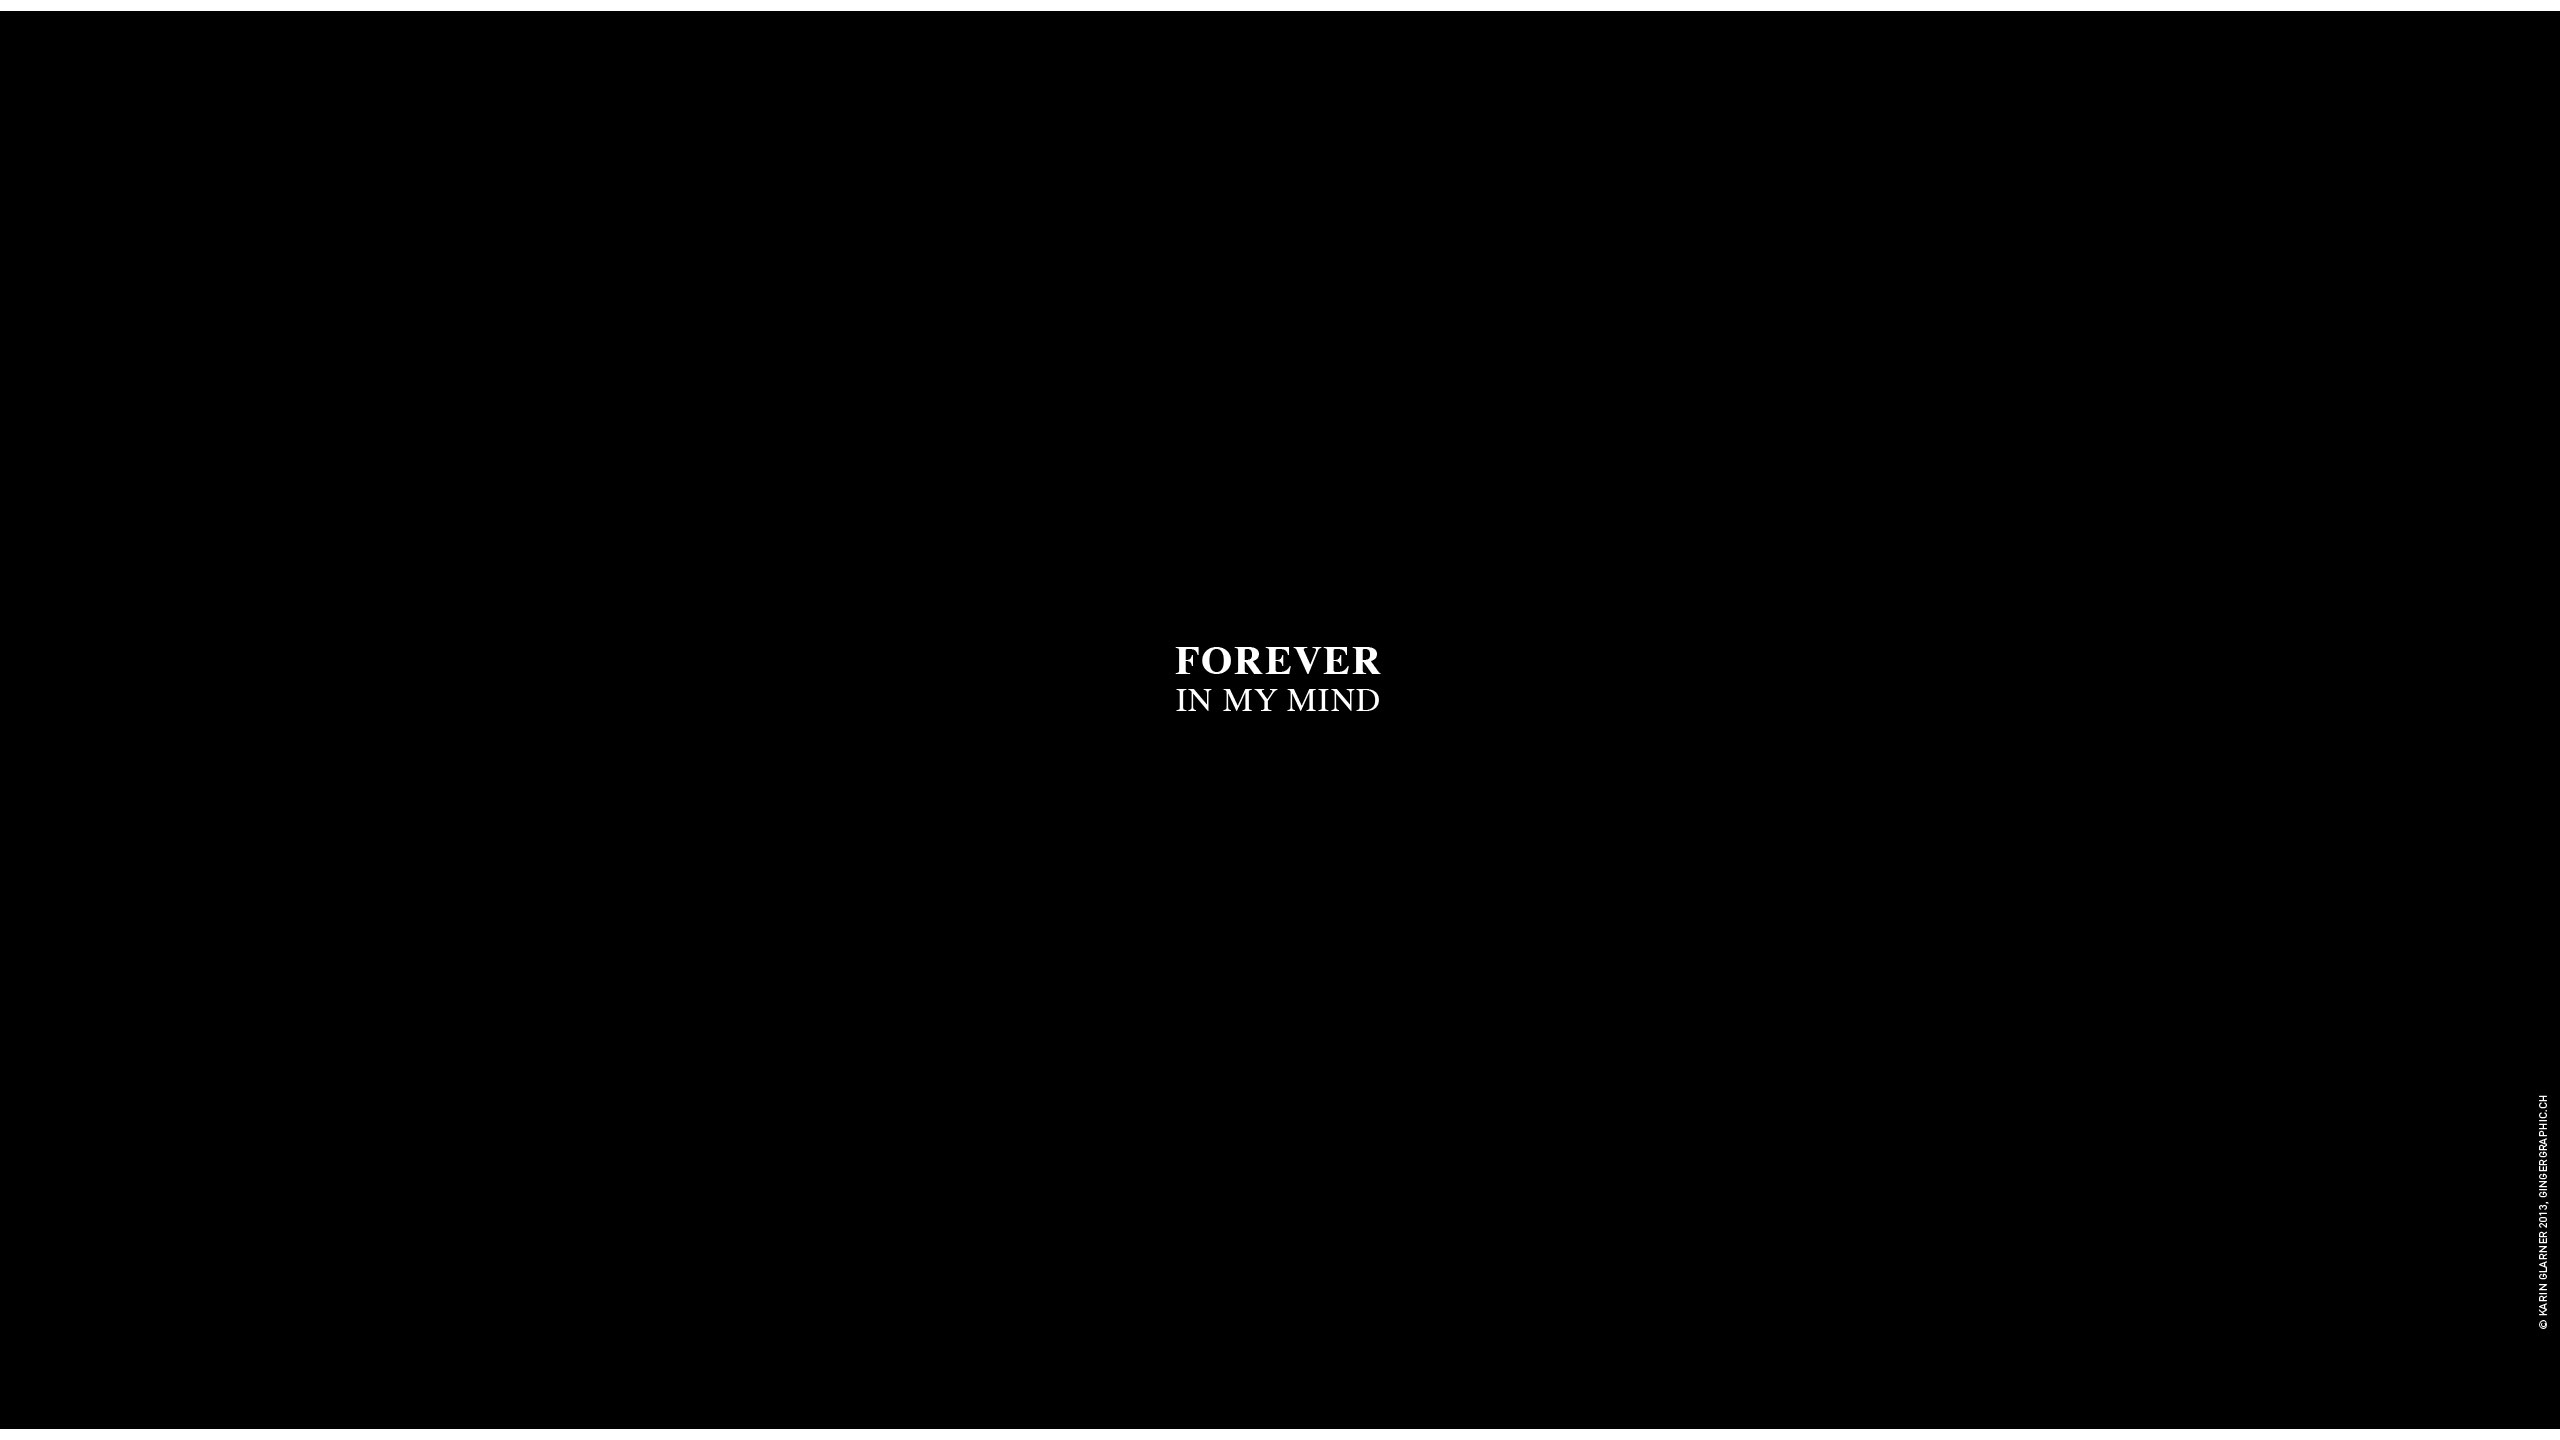 30_forever_copyrightgingergraphic_ch_kglarner